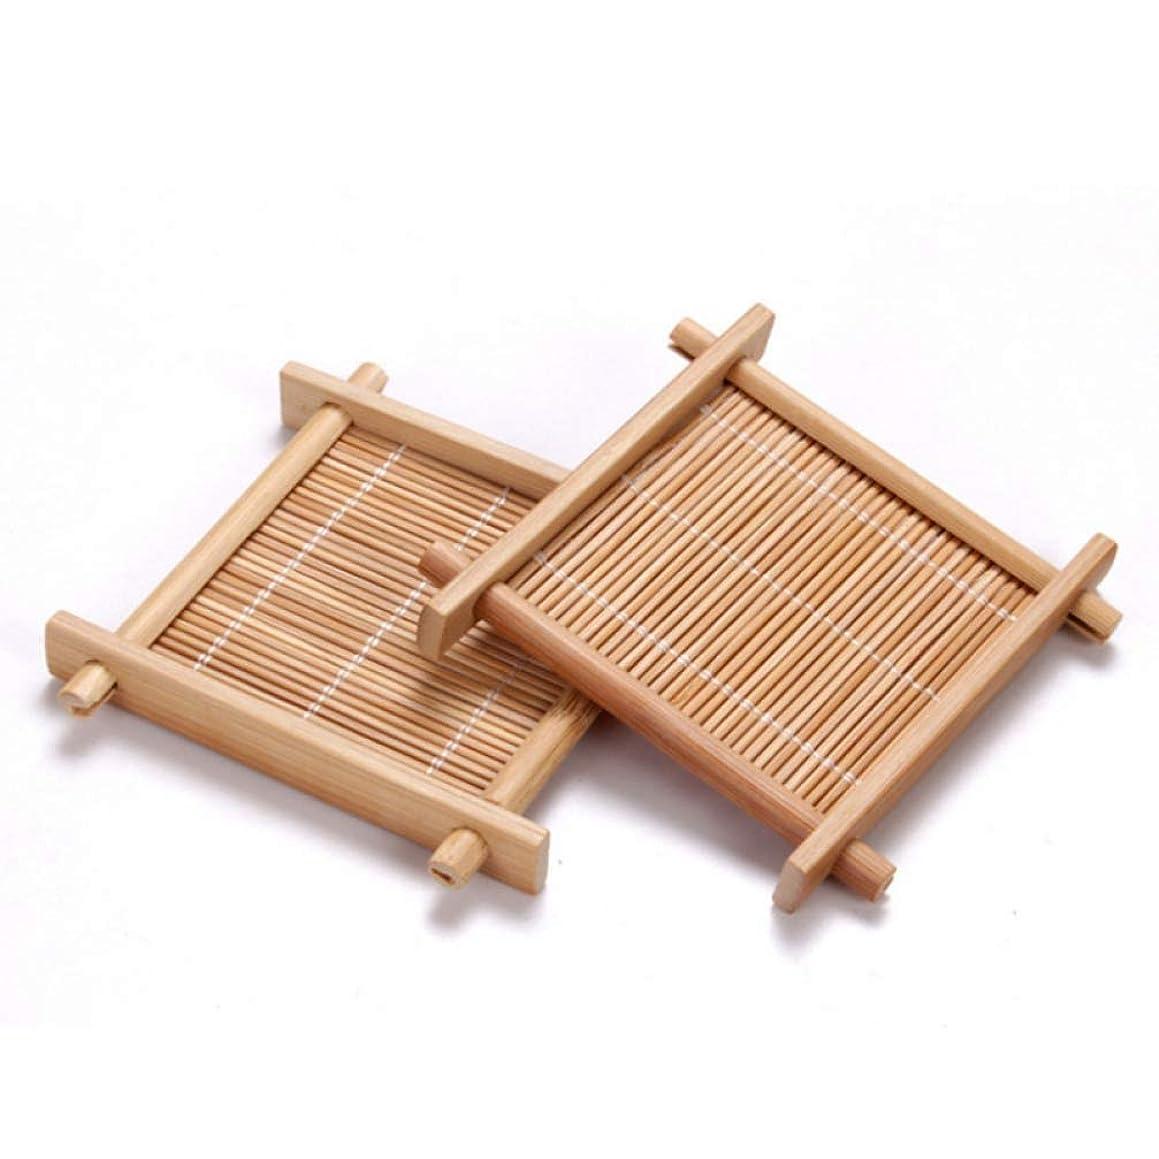 RXIN 6pcs/lot Bamboo Coasters Teacup Saucers Sets Square Handmade Tea Cup Mat for Kung Fu Tea